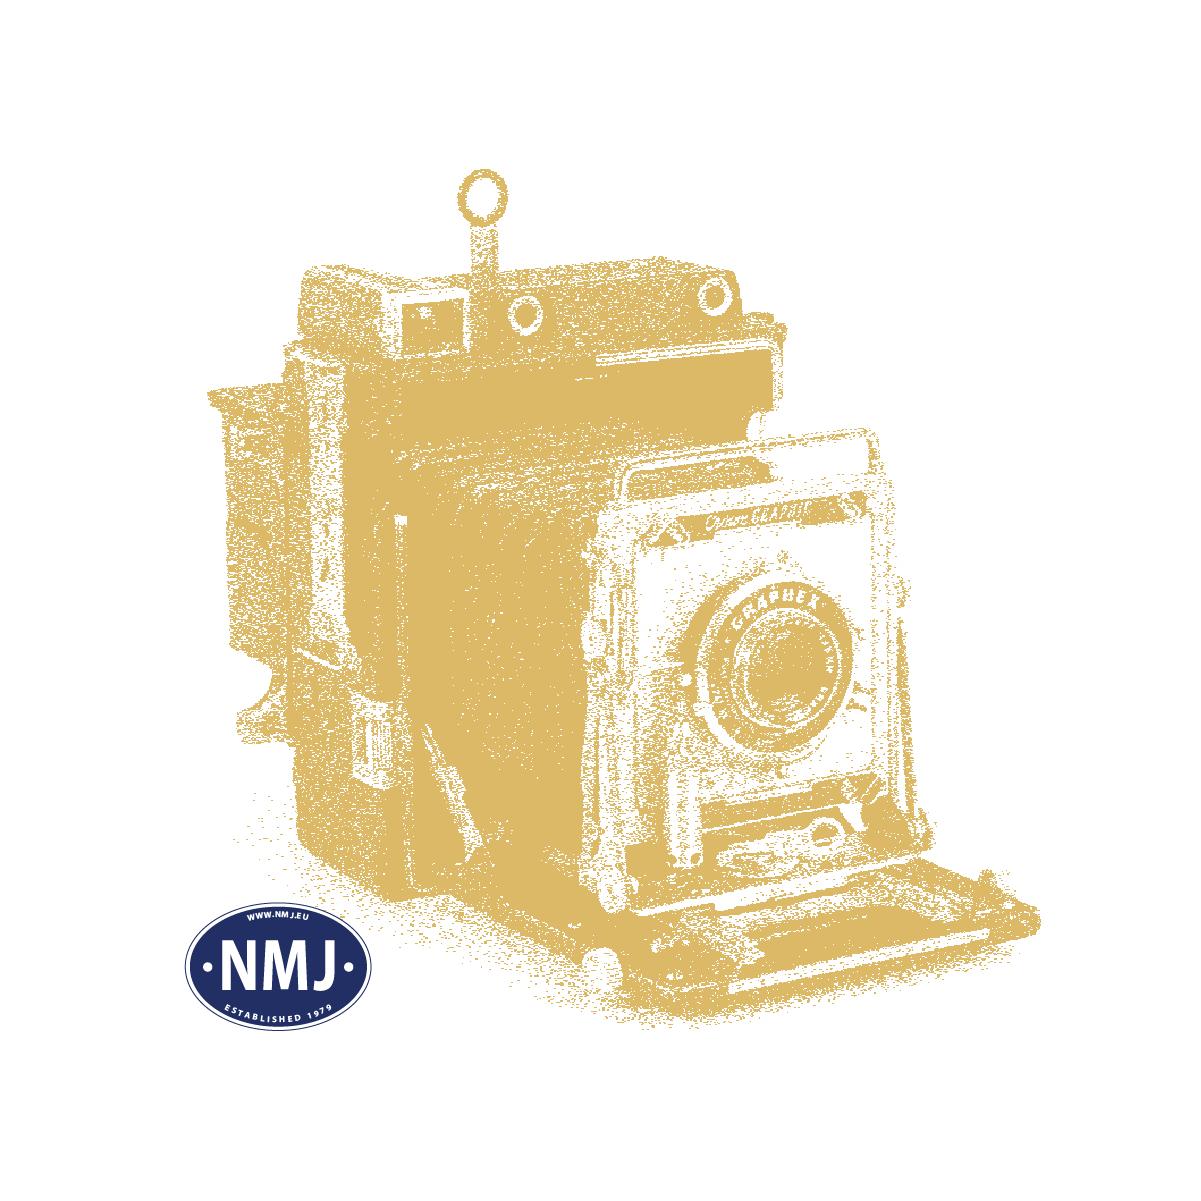 MBR55-1020 - Gressmatte #20, 20 x 30 Cm